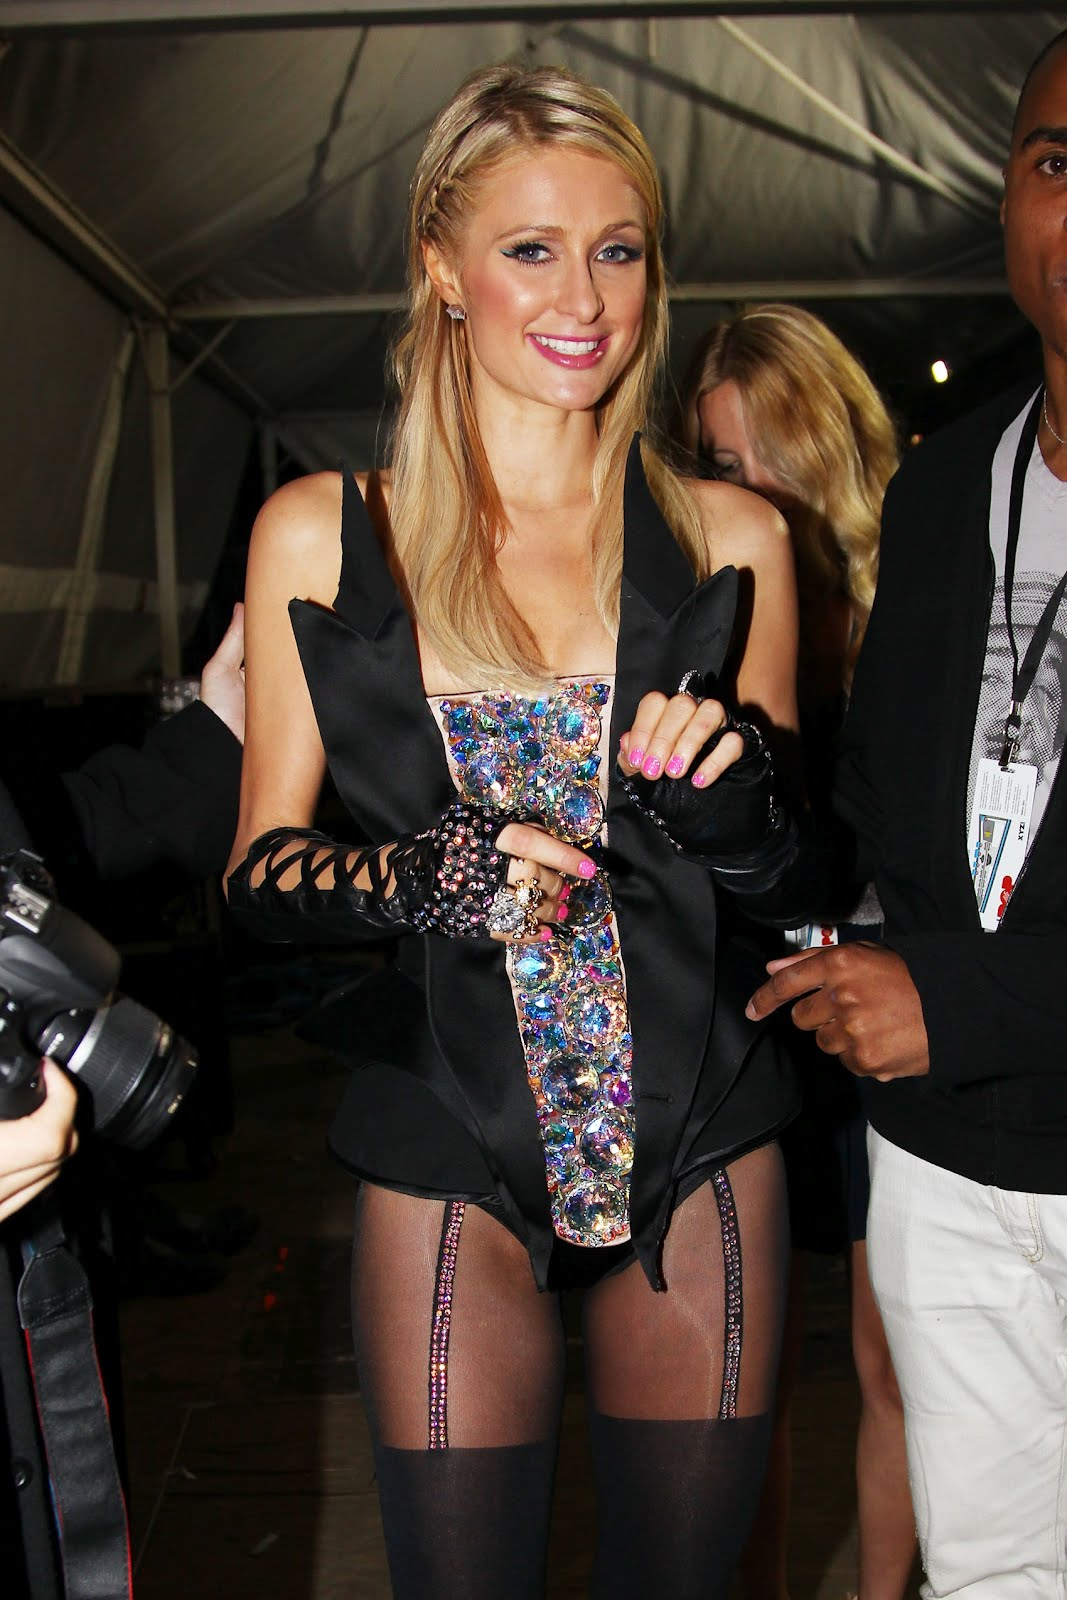 Hanna hilton pantyhose miniskirt - 1 part 10